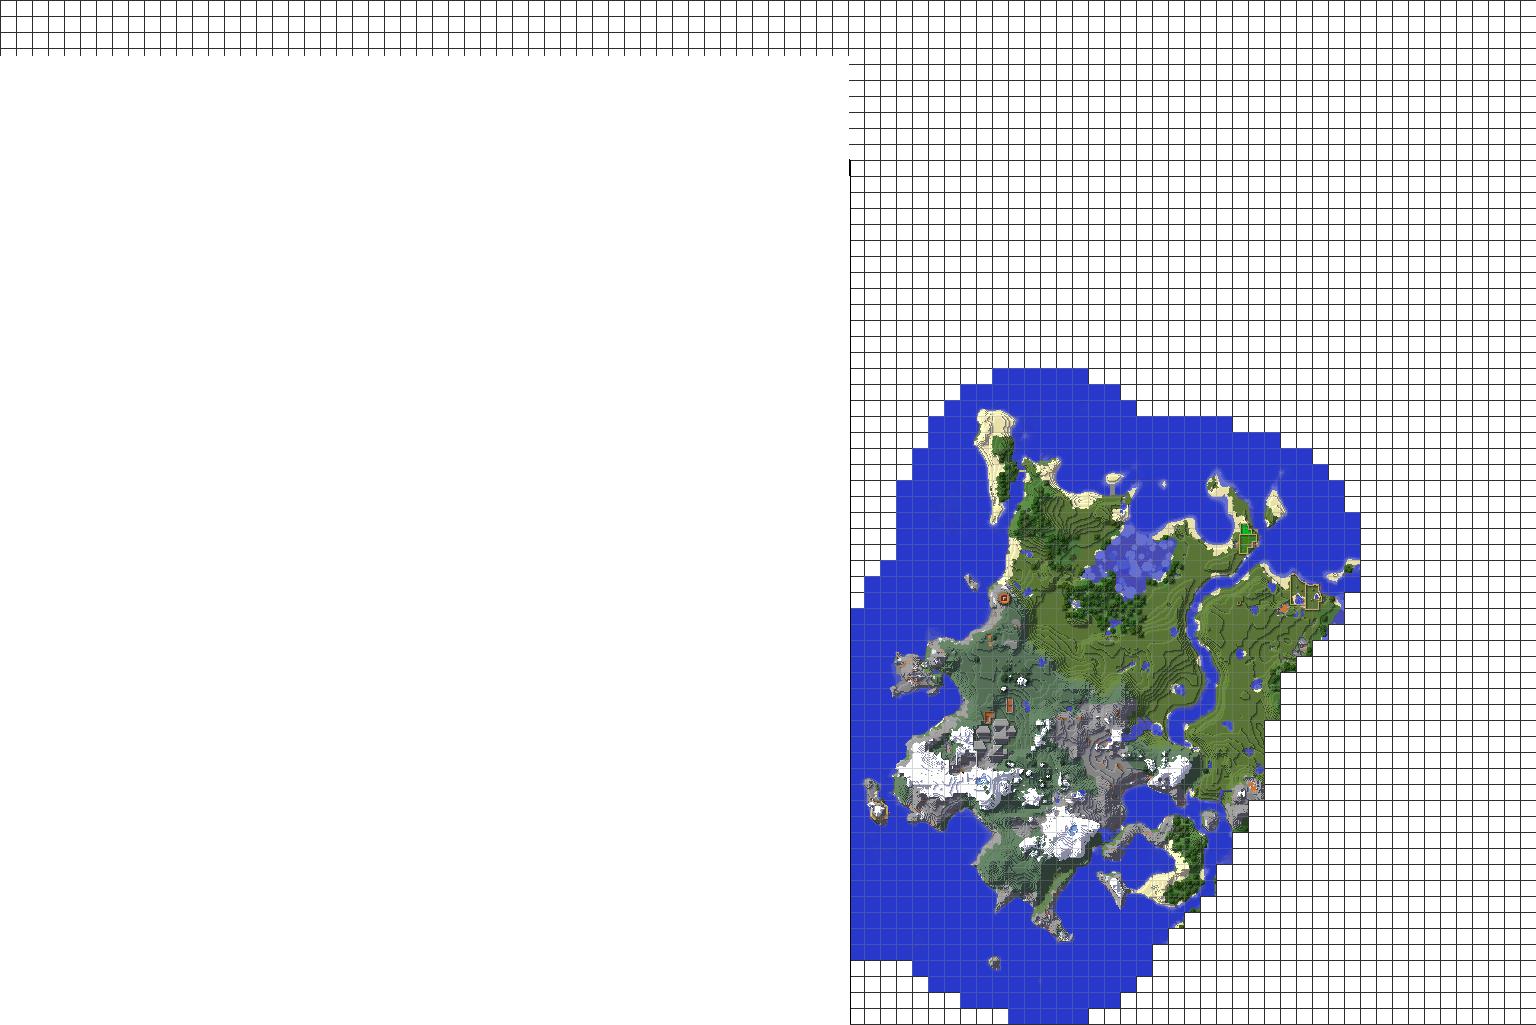 2018-06-08_20.08.55_Minecraft~_overworld_day.png